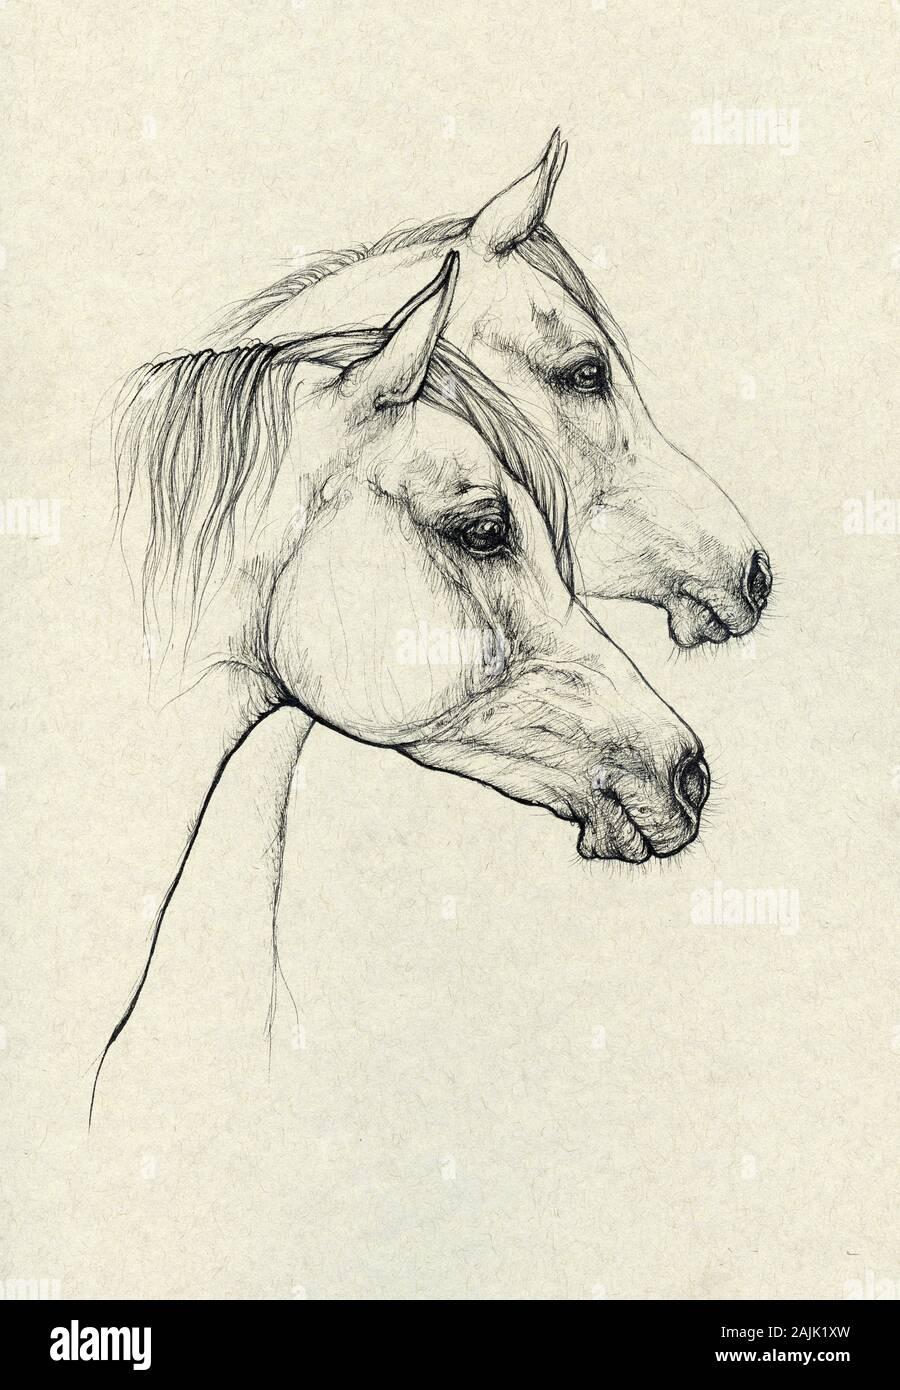 Arabian Horses Stock Photo Alamy